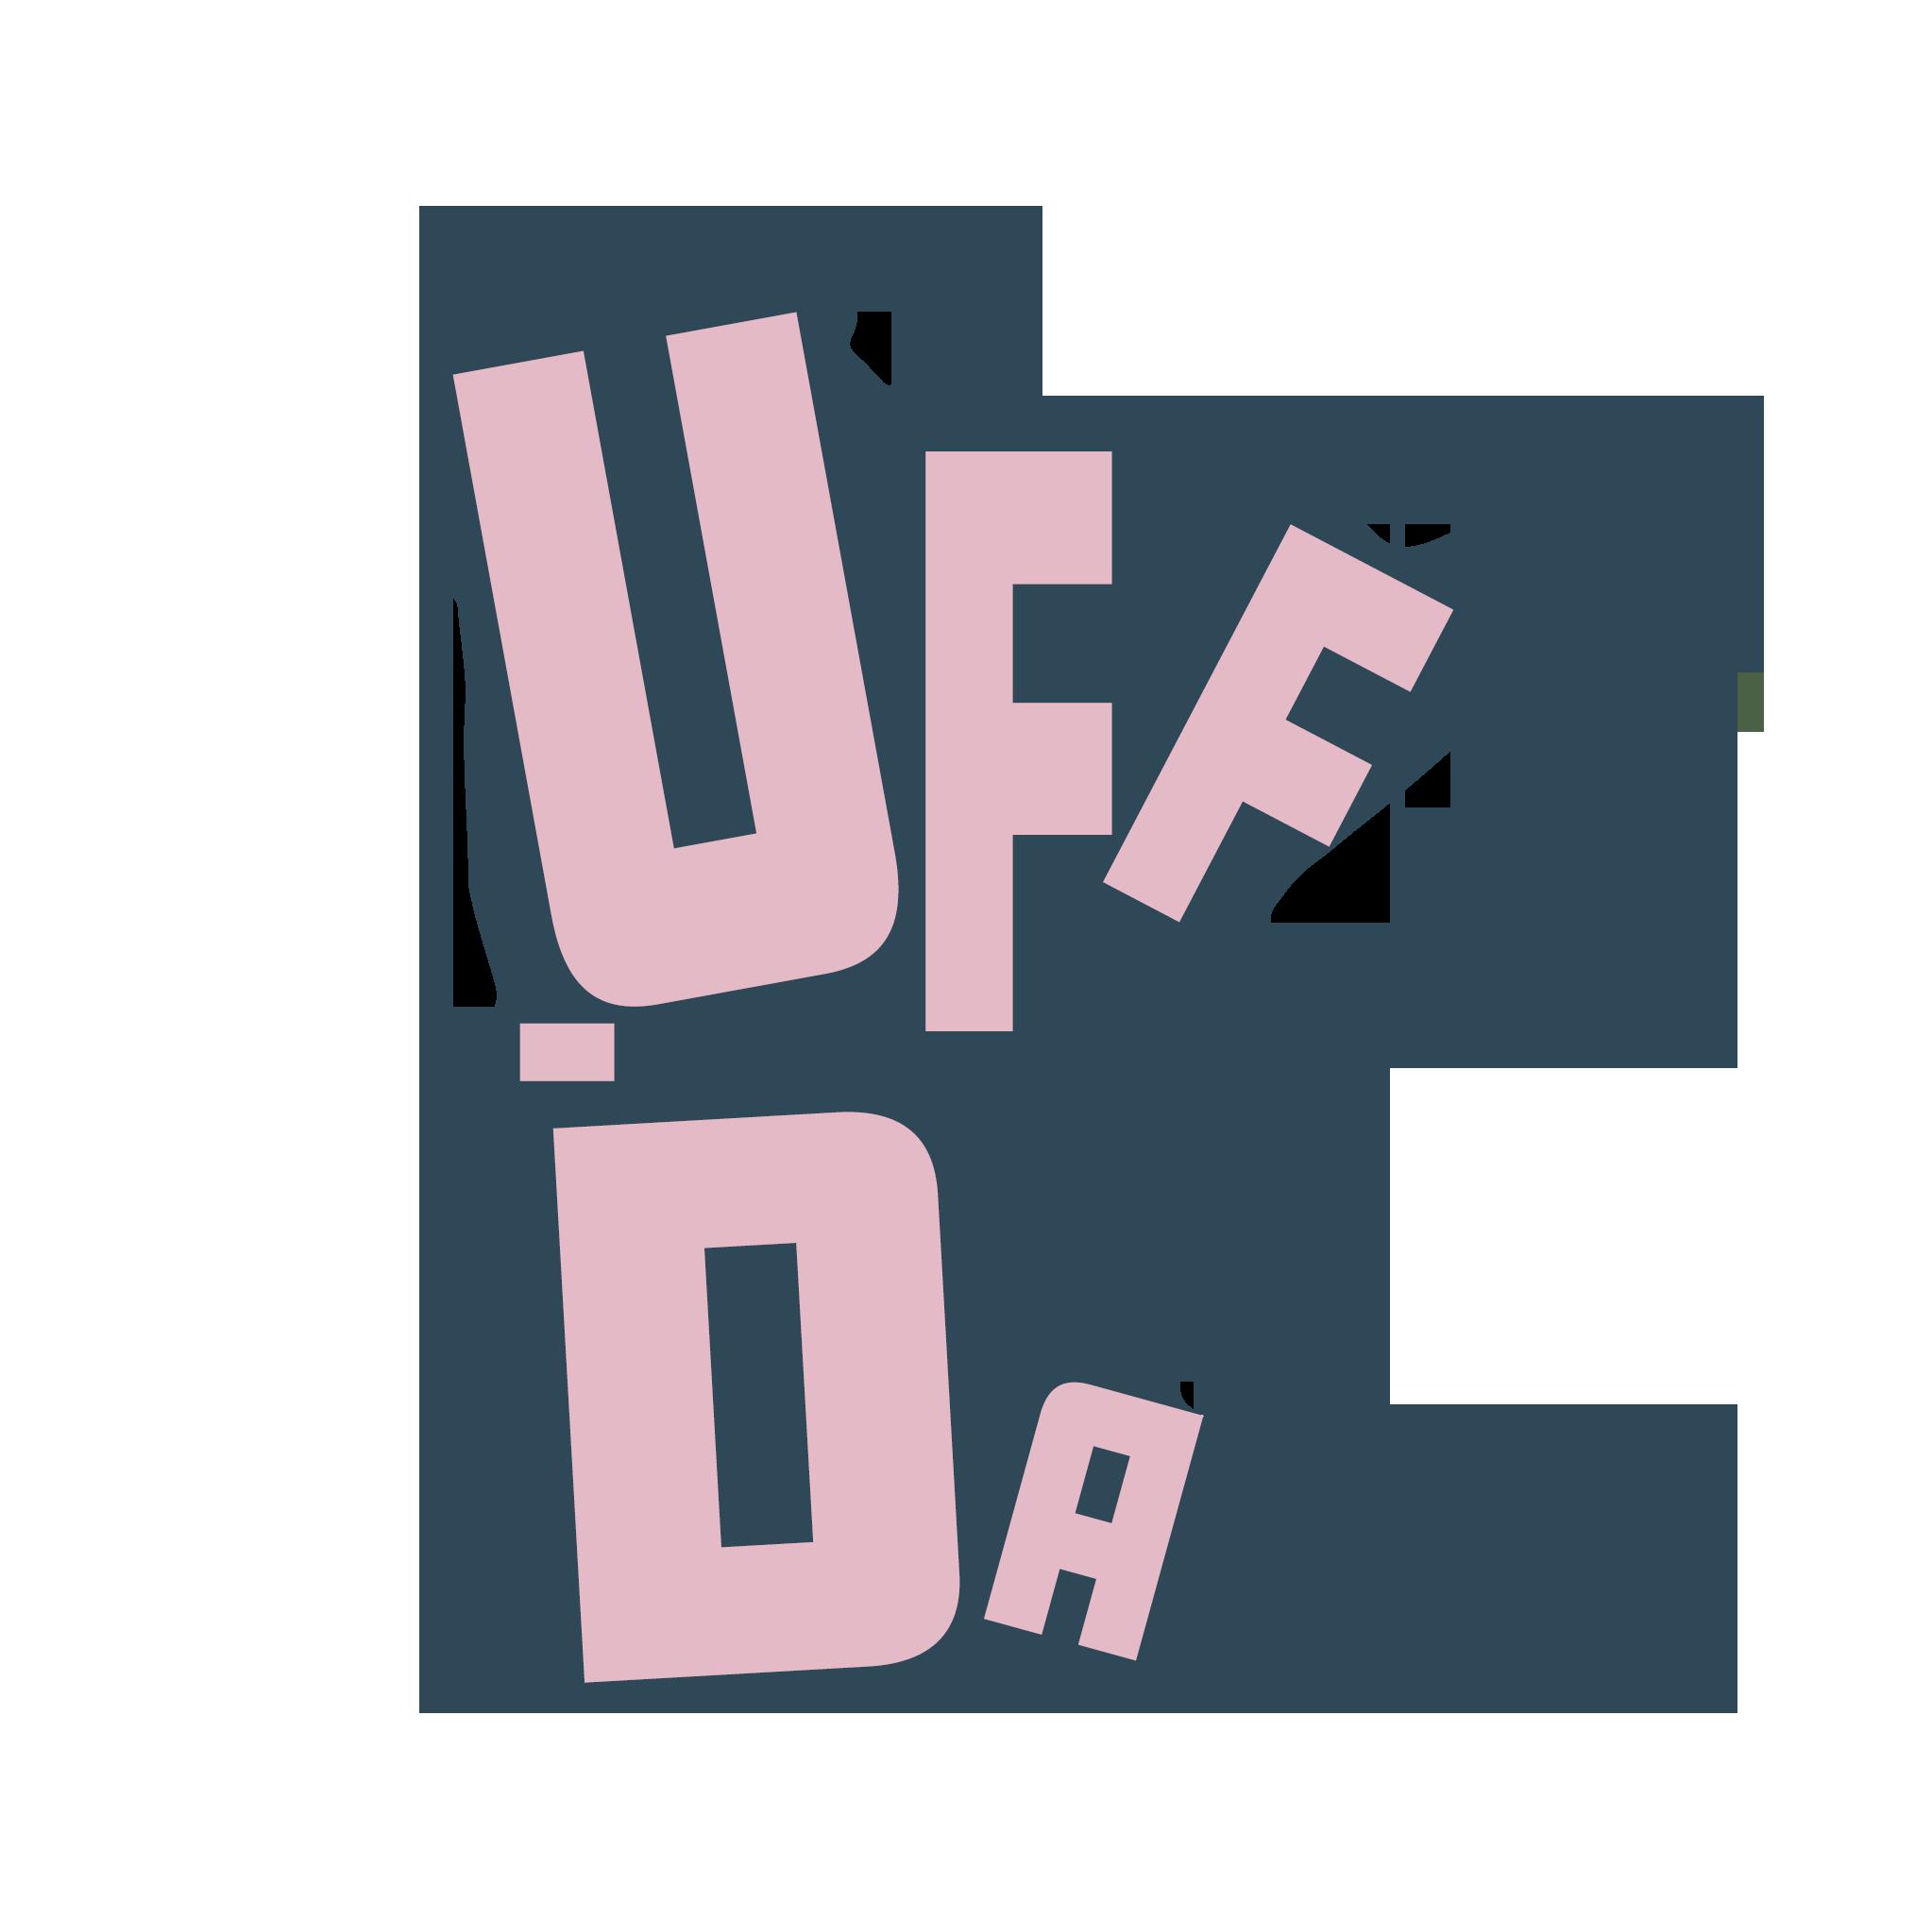 uffda.png